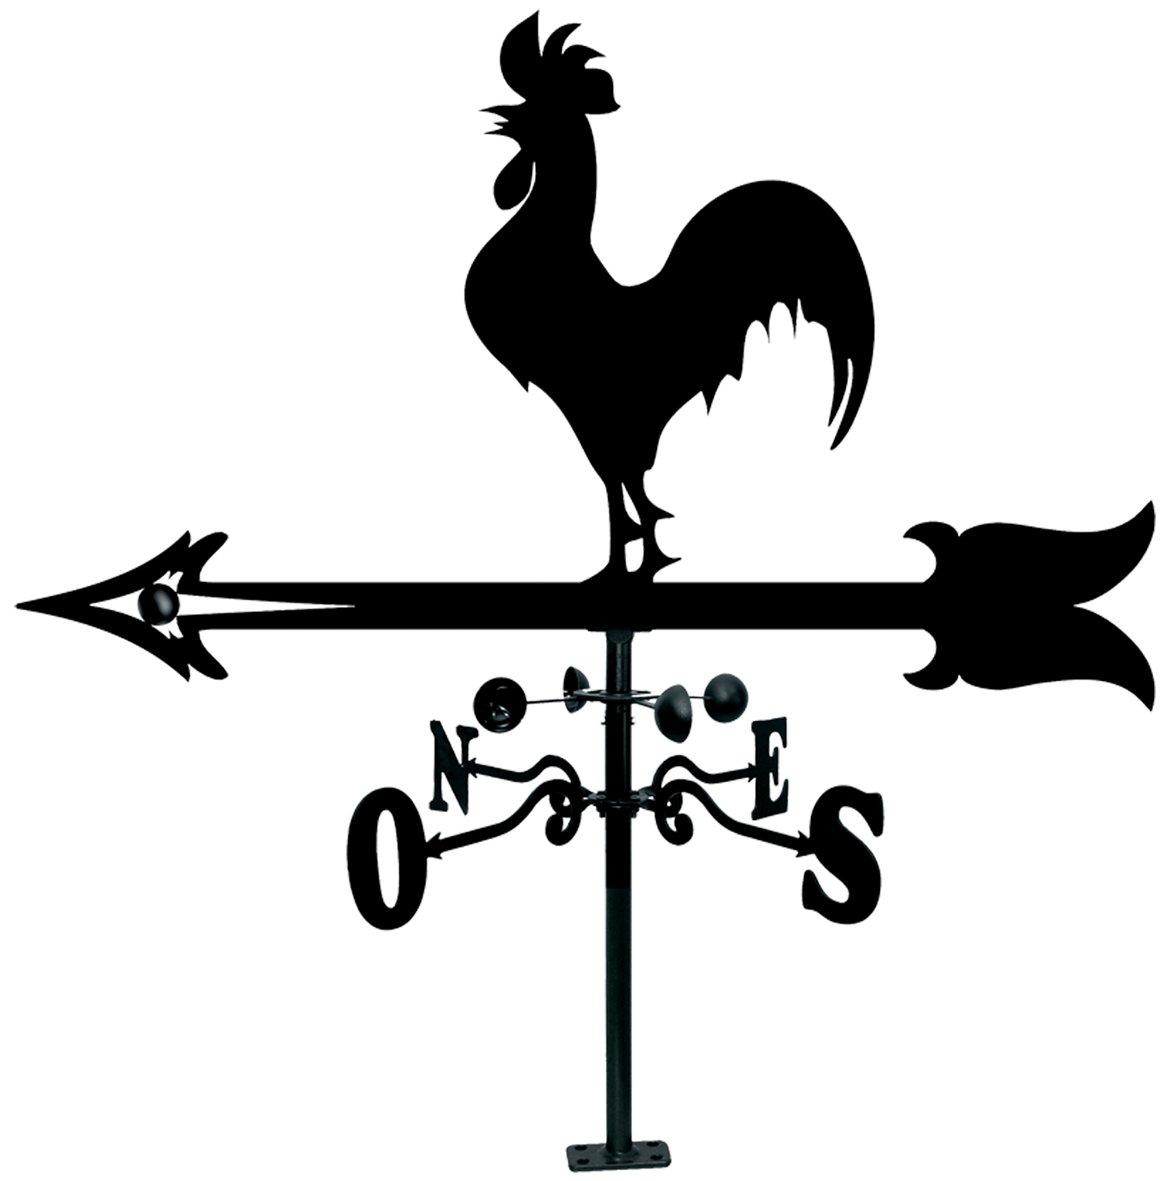 Girouette de Jardin : Comparatif et Guide de Meilleurs Produits avec Avis